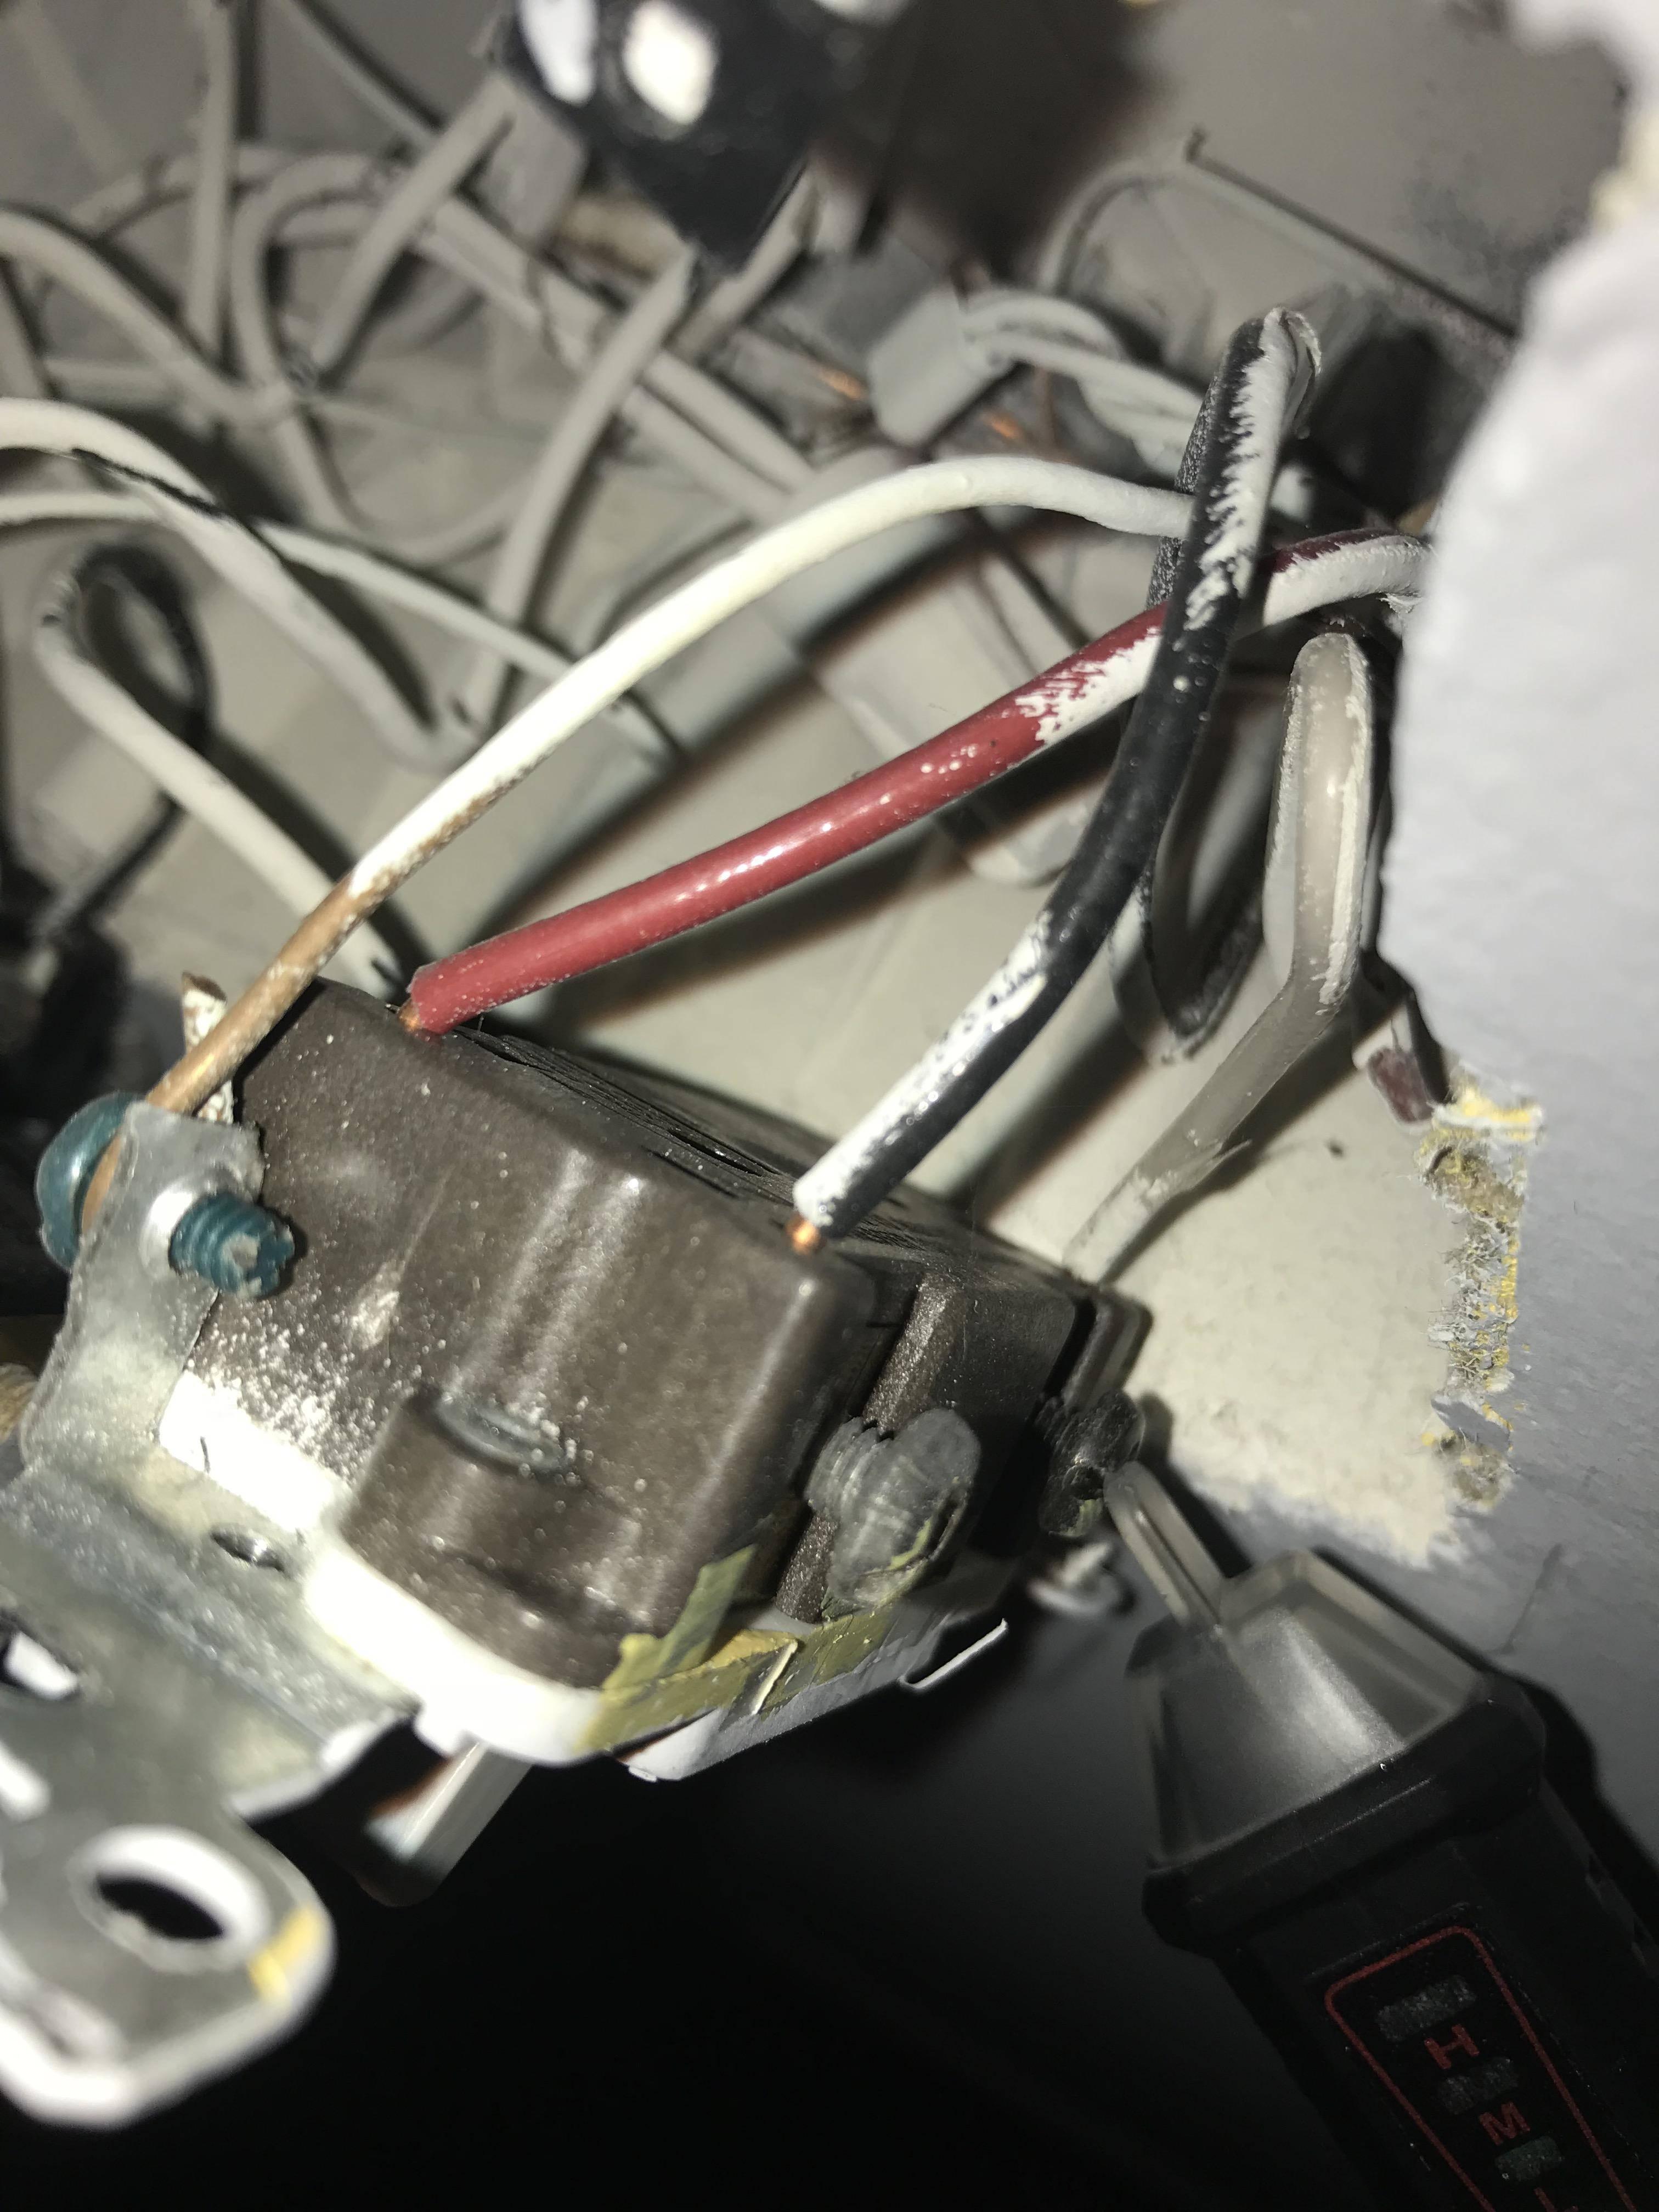 4 Way Light Switch Not Working